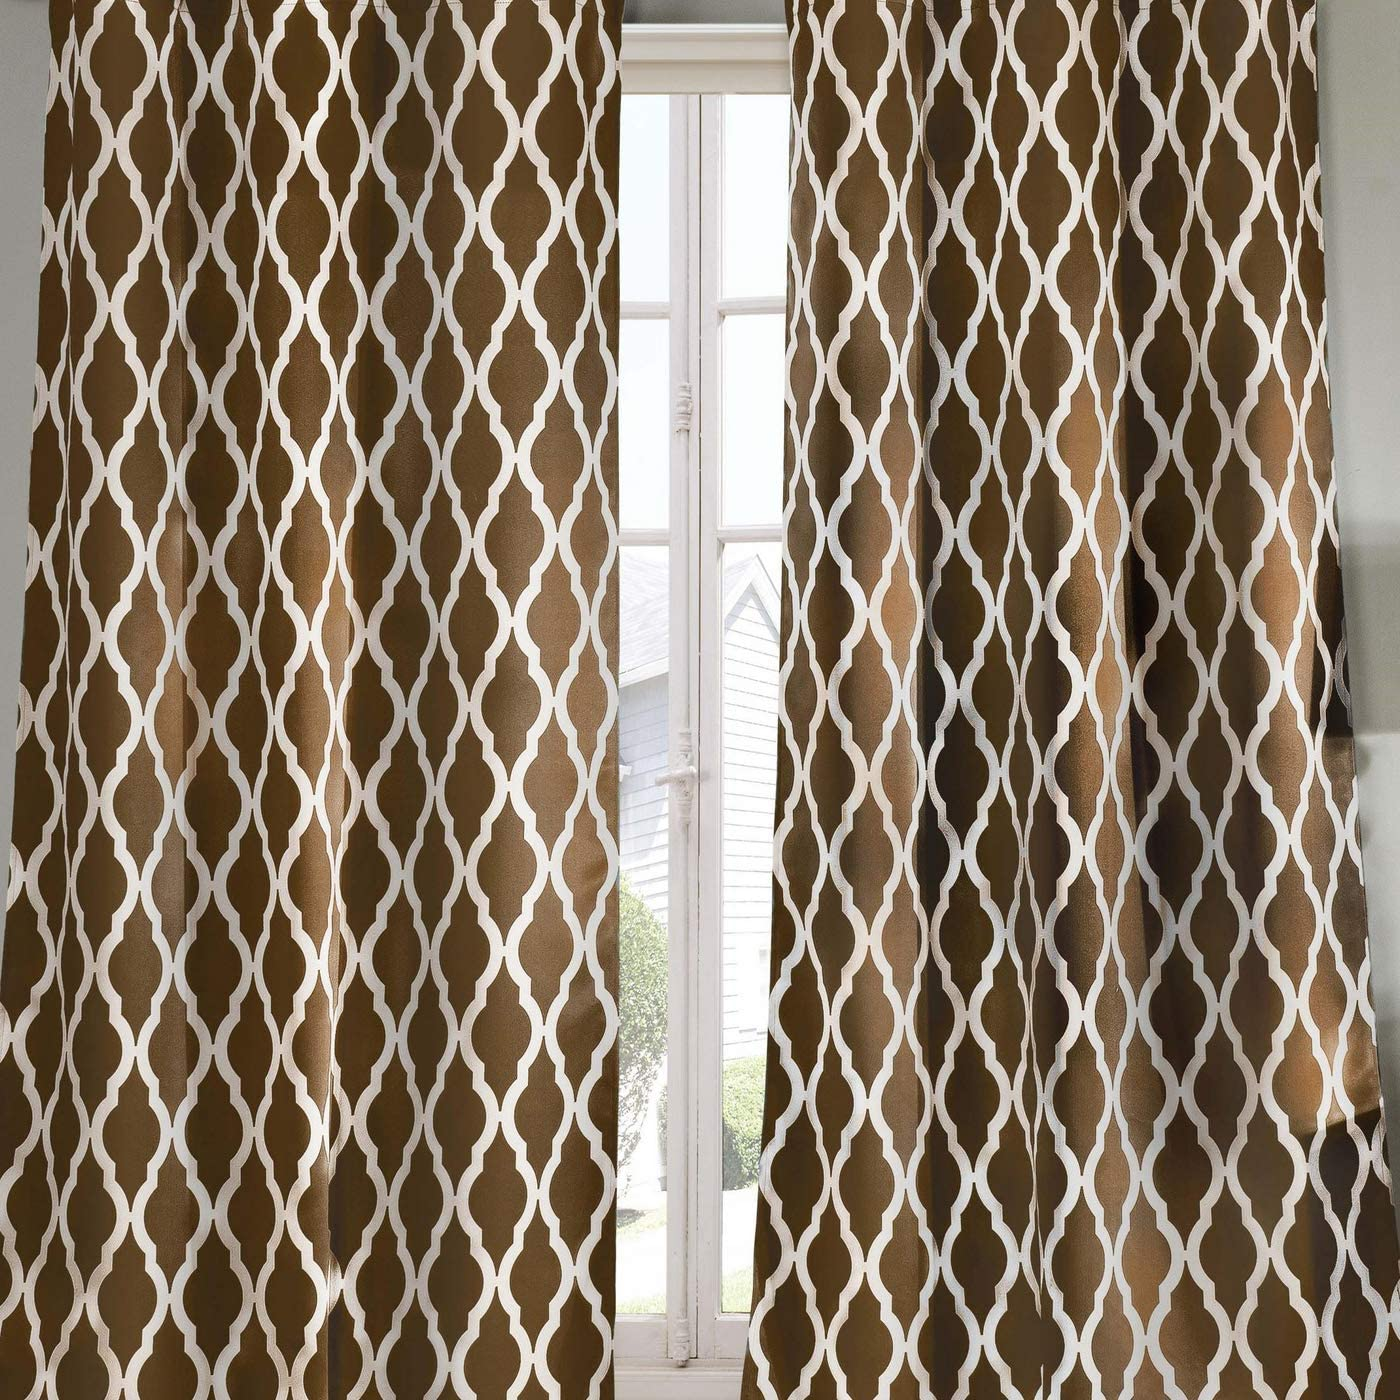 38 x 84 Green Blackout365 Kittattinny Heavy Geometric Blackout Window Curtain Set of 2 Panels